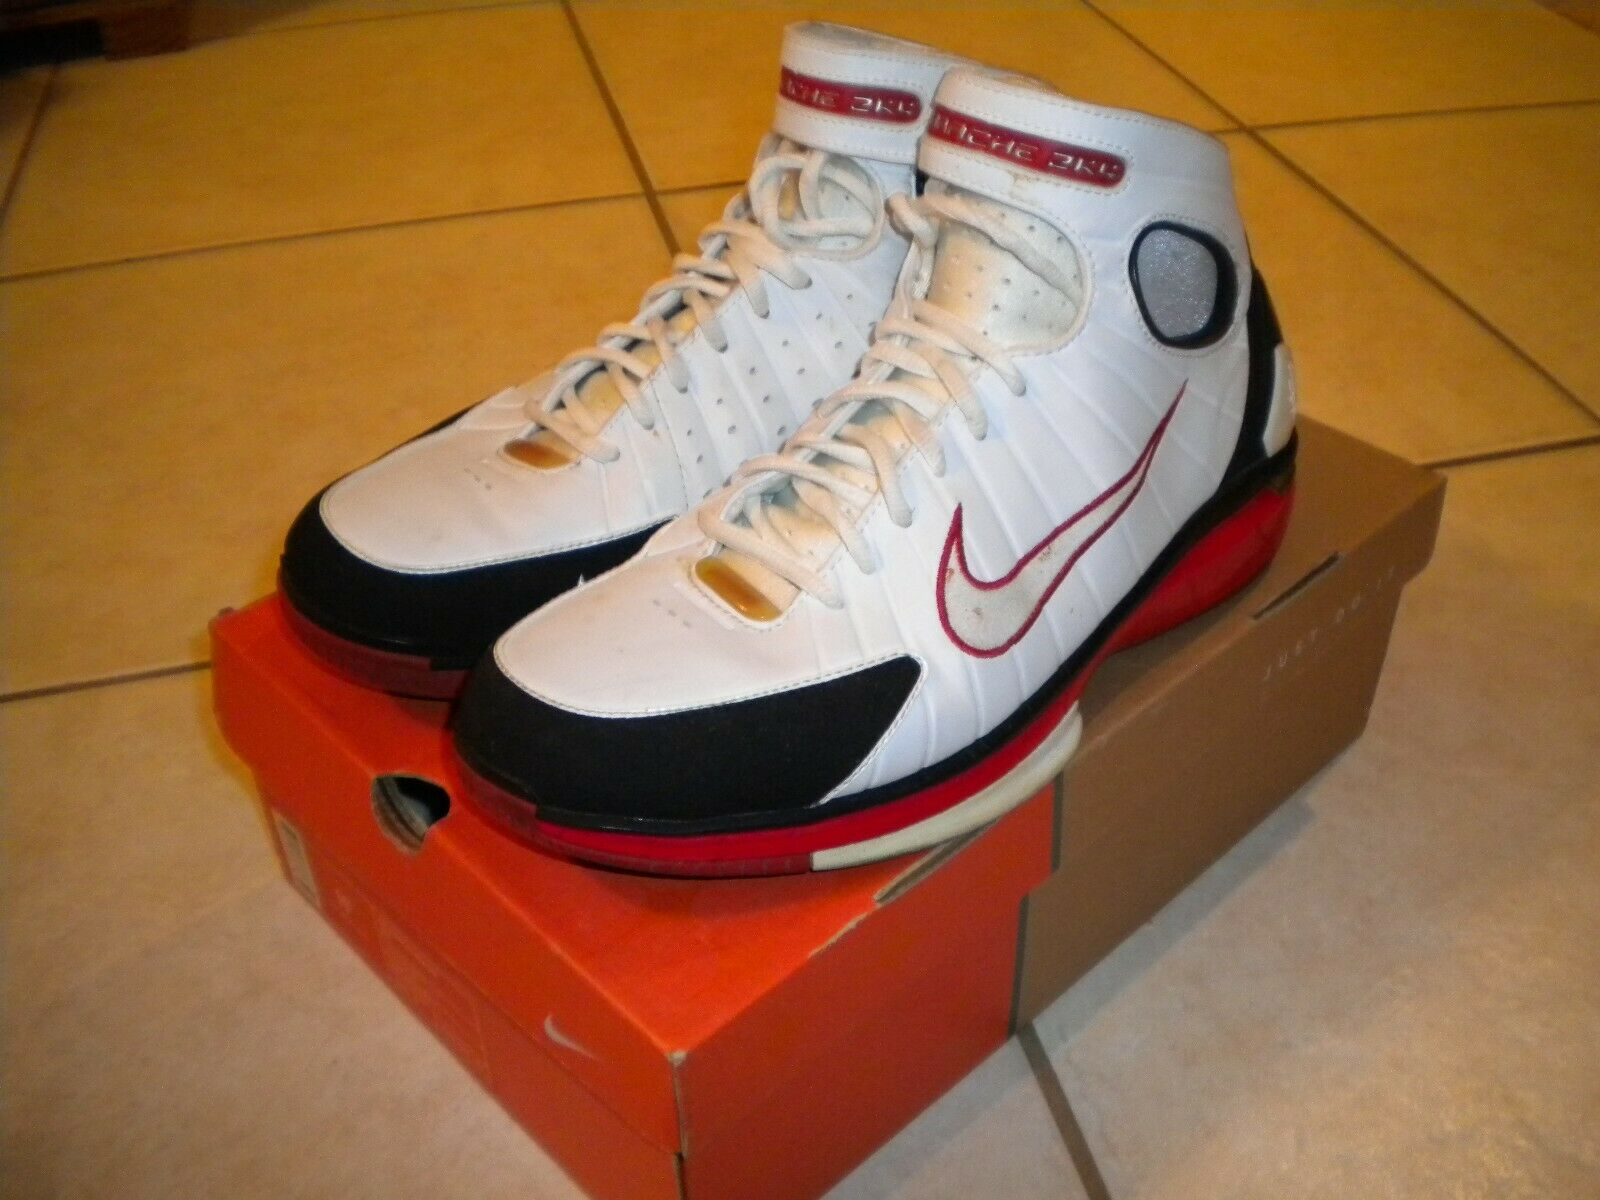 Nike Zoom Huarache 2K4 Kobe Bryant Lakers white red black Size 11.5